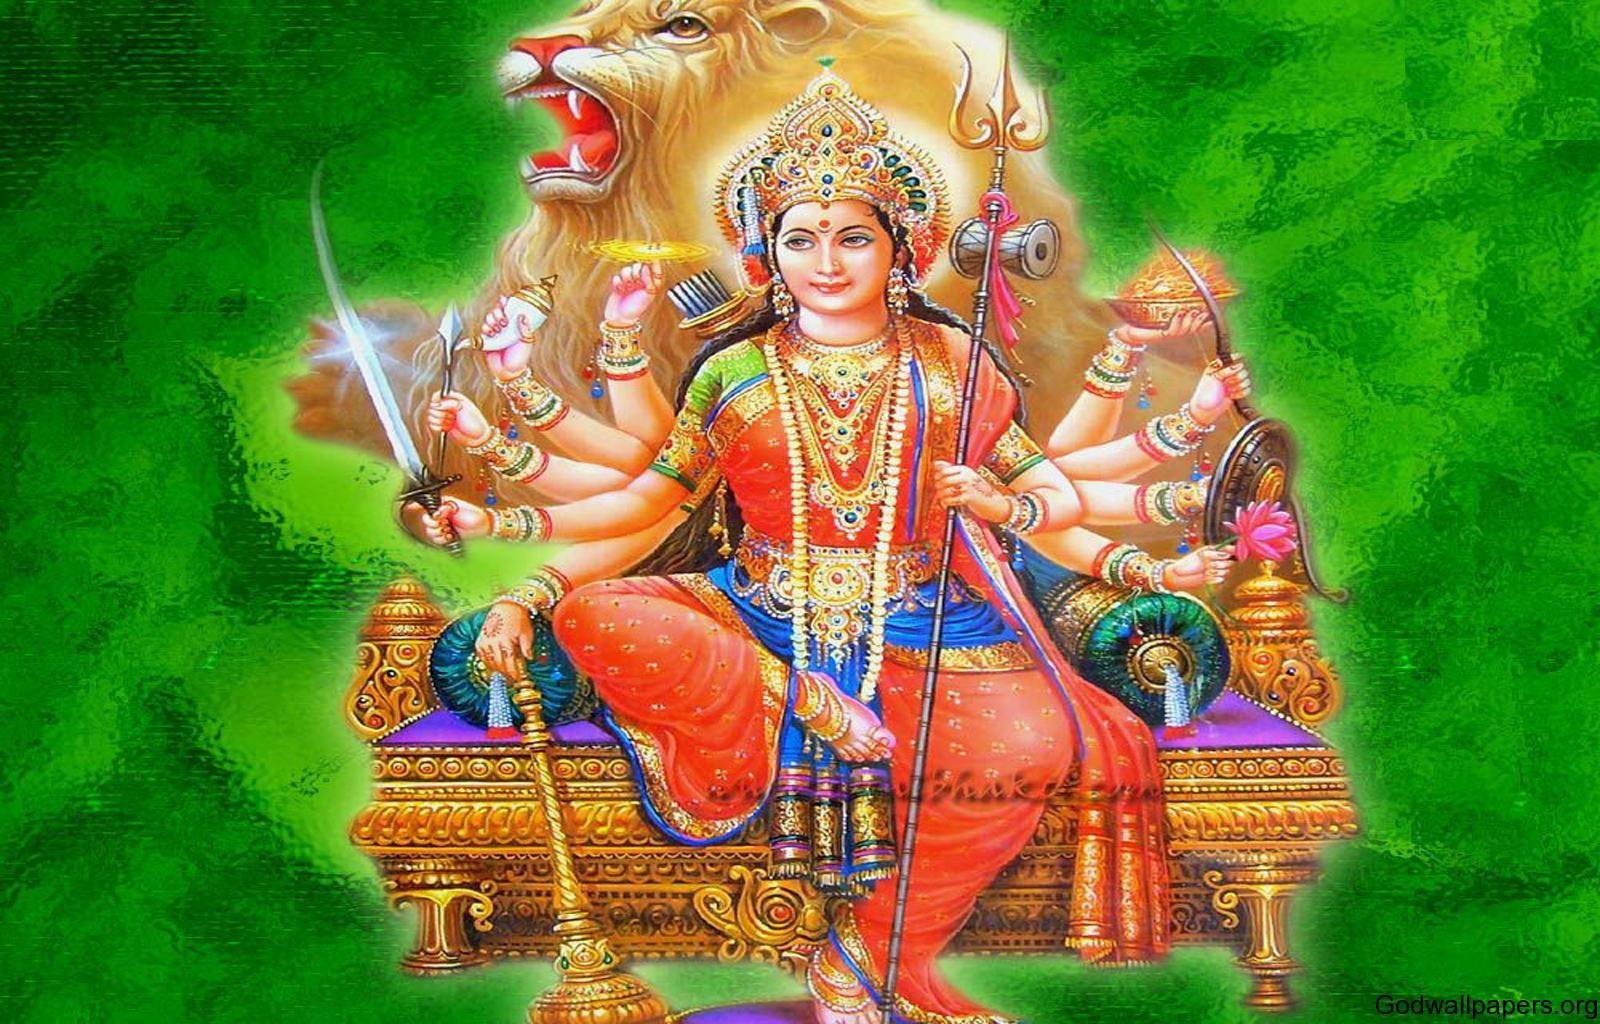 Popular Wallpaper Lord Ayyappan - bm-image-792974  Trends_1008961.jpeg